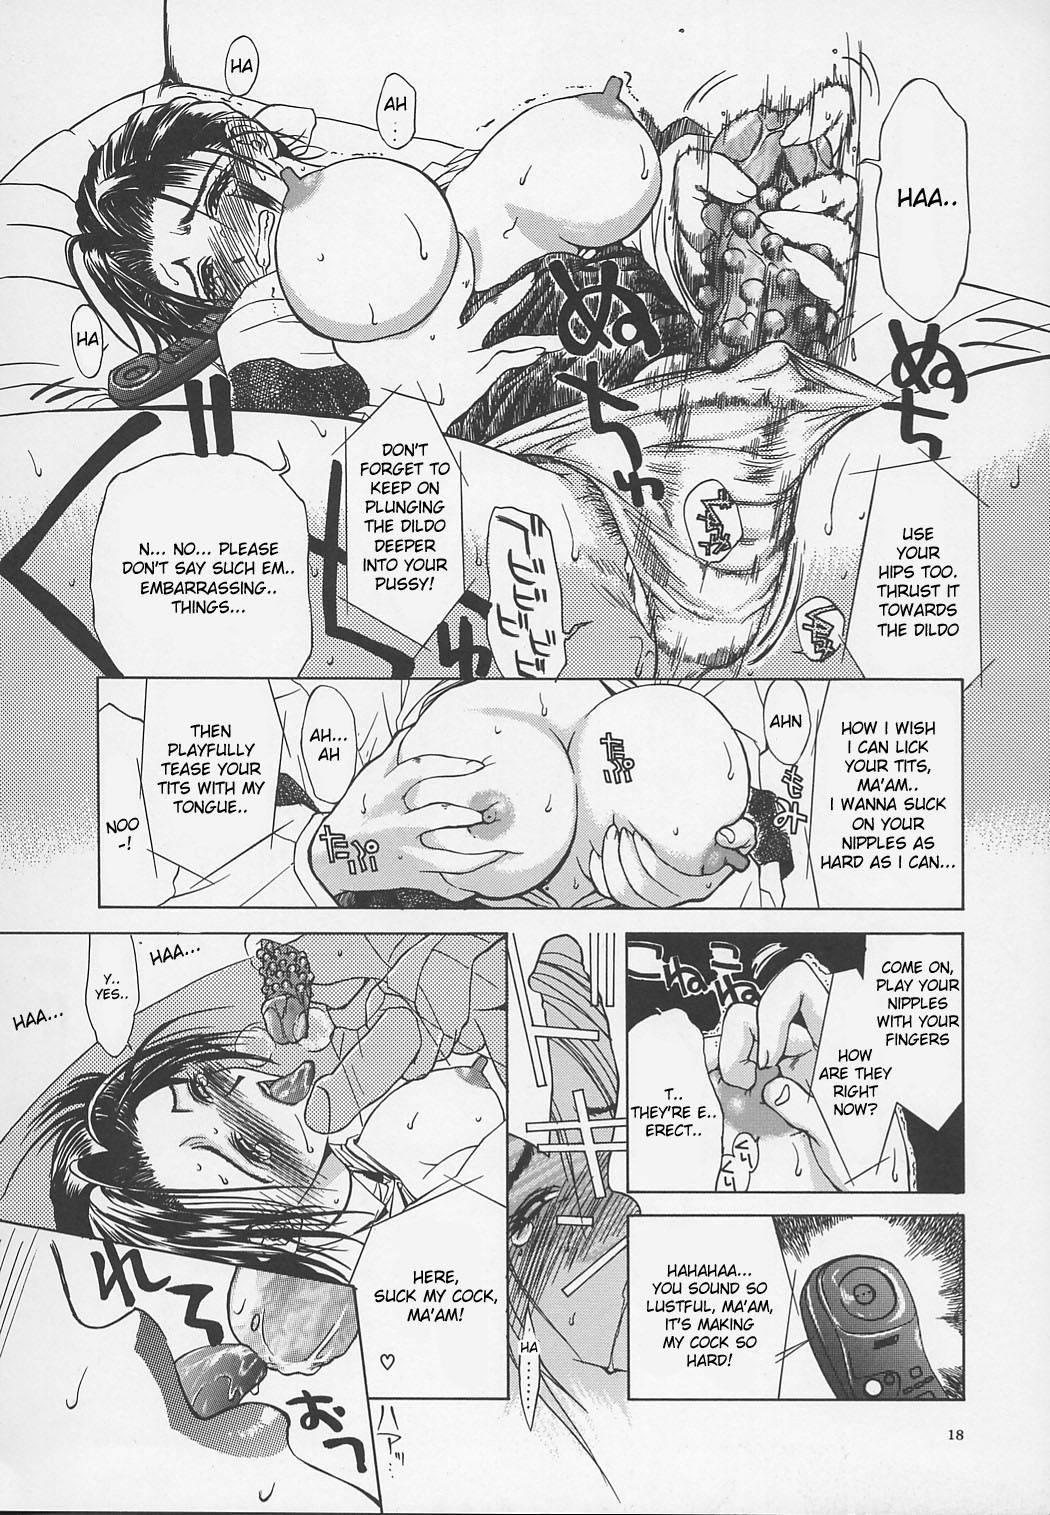 Heart erotic manga mother